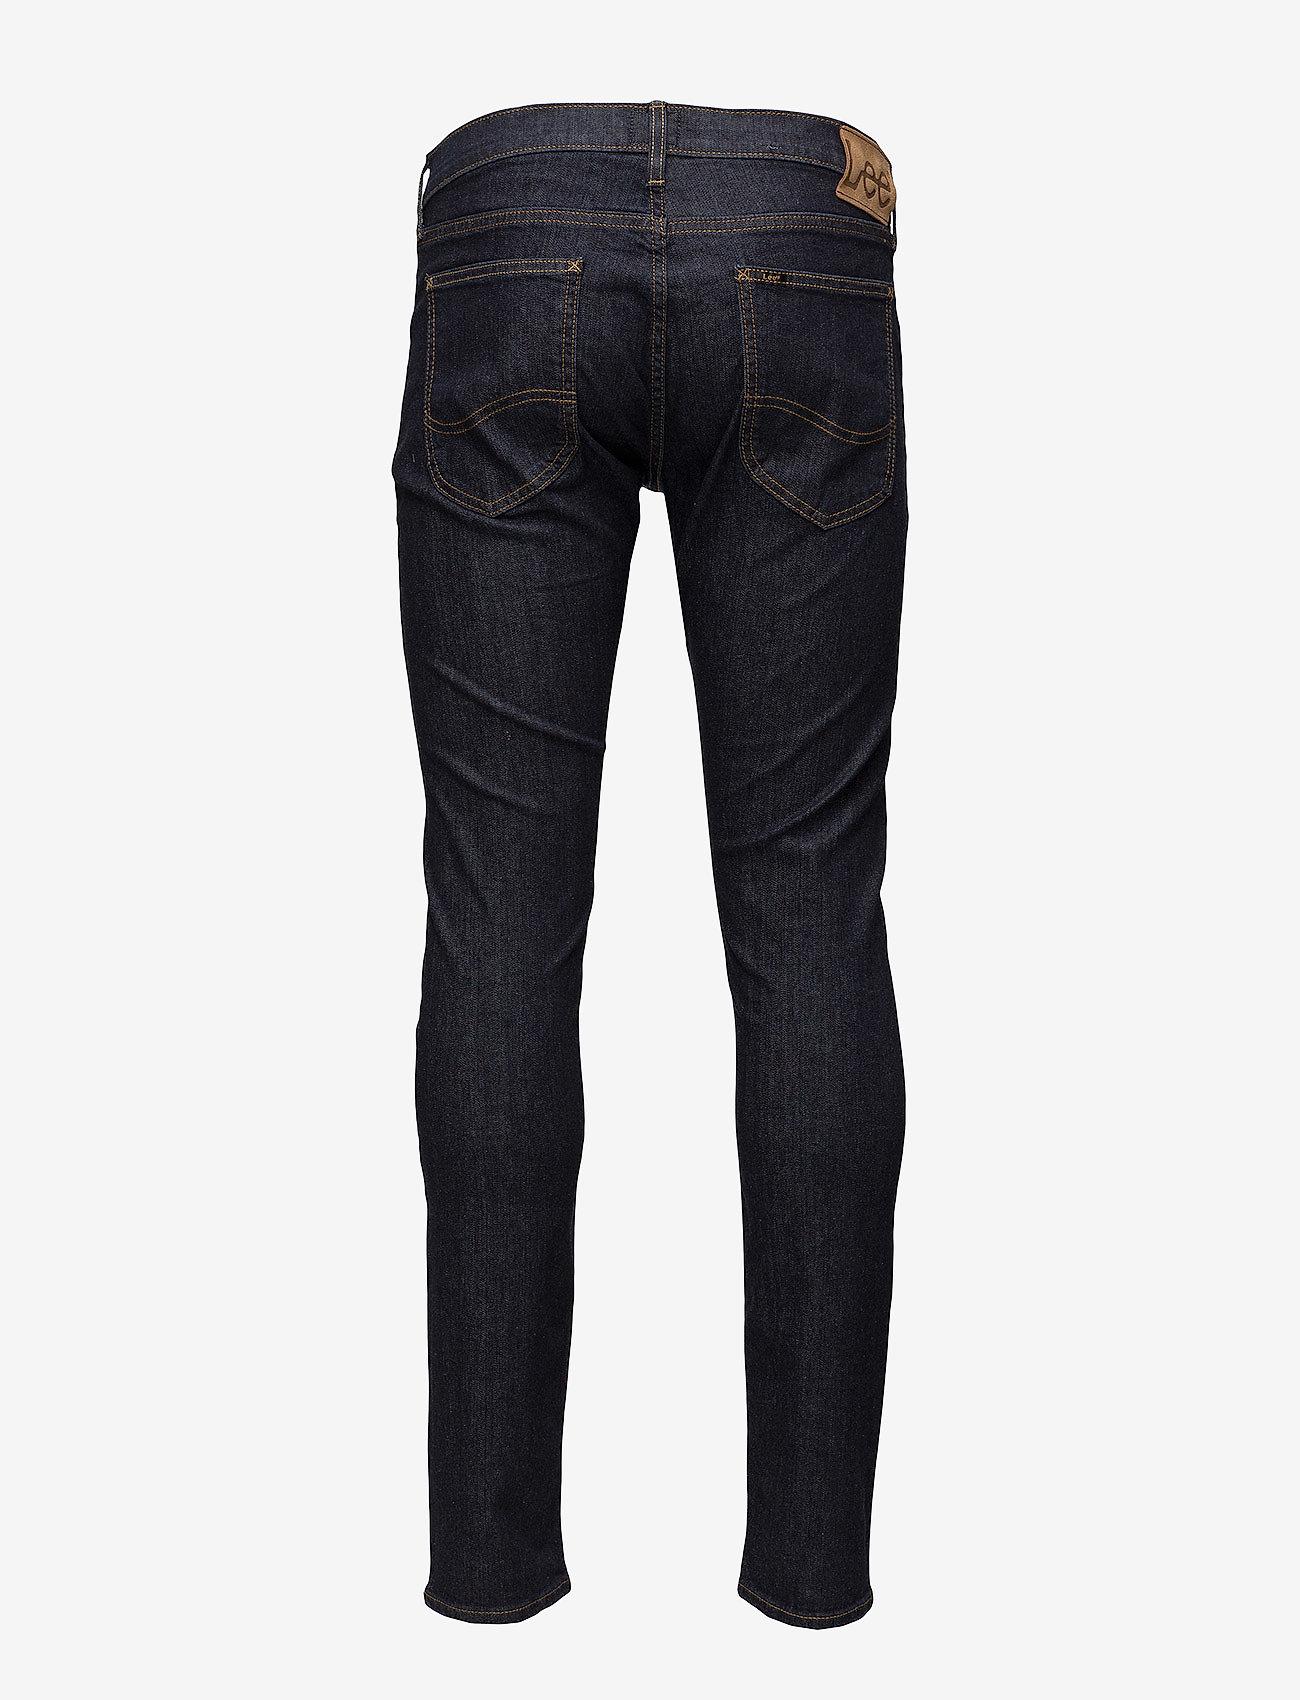 Lee Jeans - LUKE - slim jeans - rinse - 1